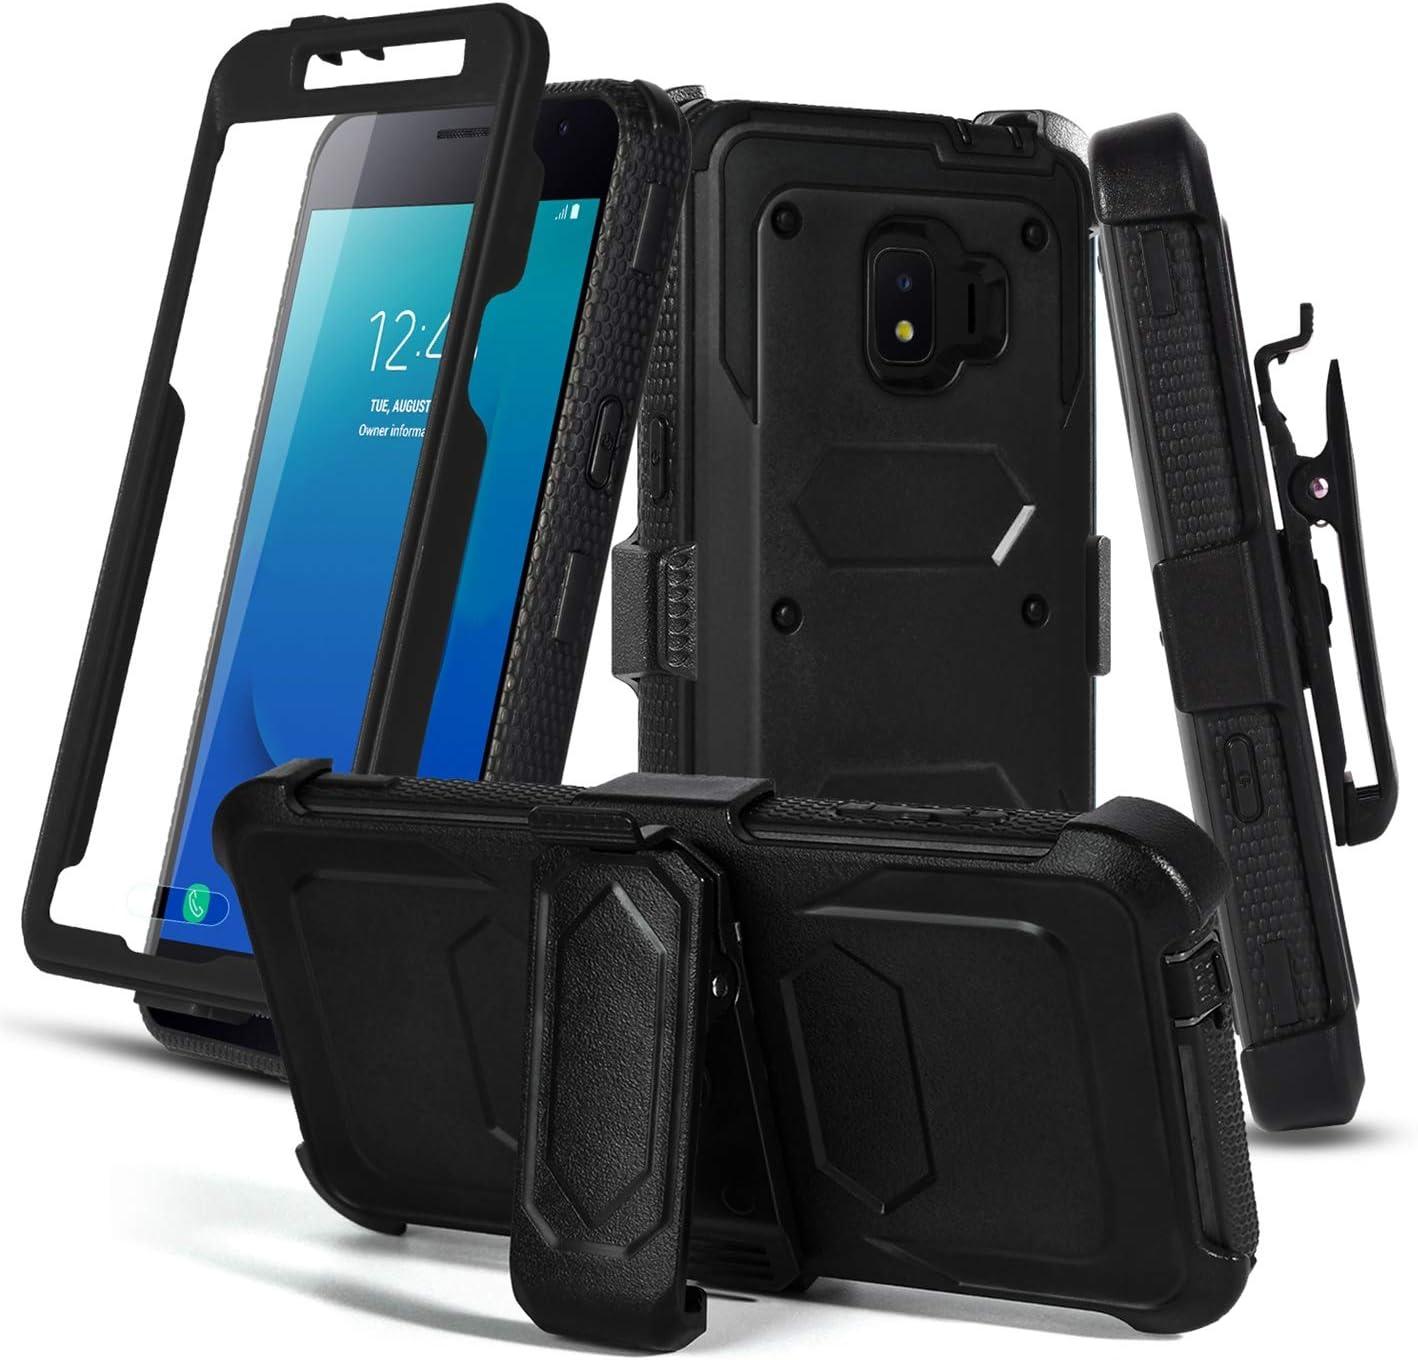 Aetech Phone Case for Samsung Galaxy J2/ J2 Core/J2 Pure/ J2 Dash / J2 Shine with Belt Clip Screen Protector Kickstand Heavy Duty for Women Men, Black